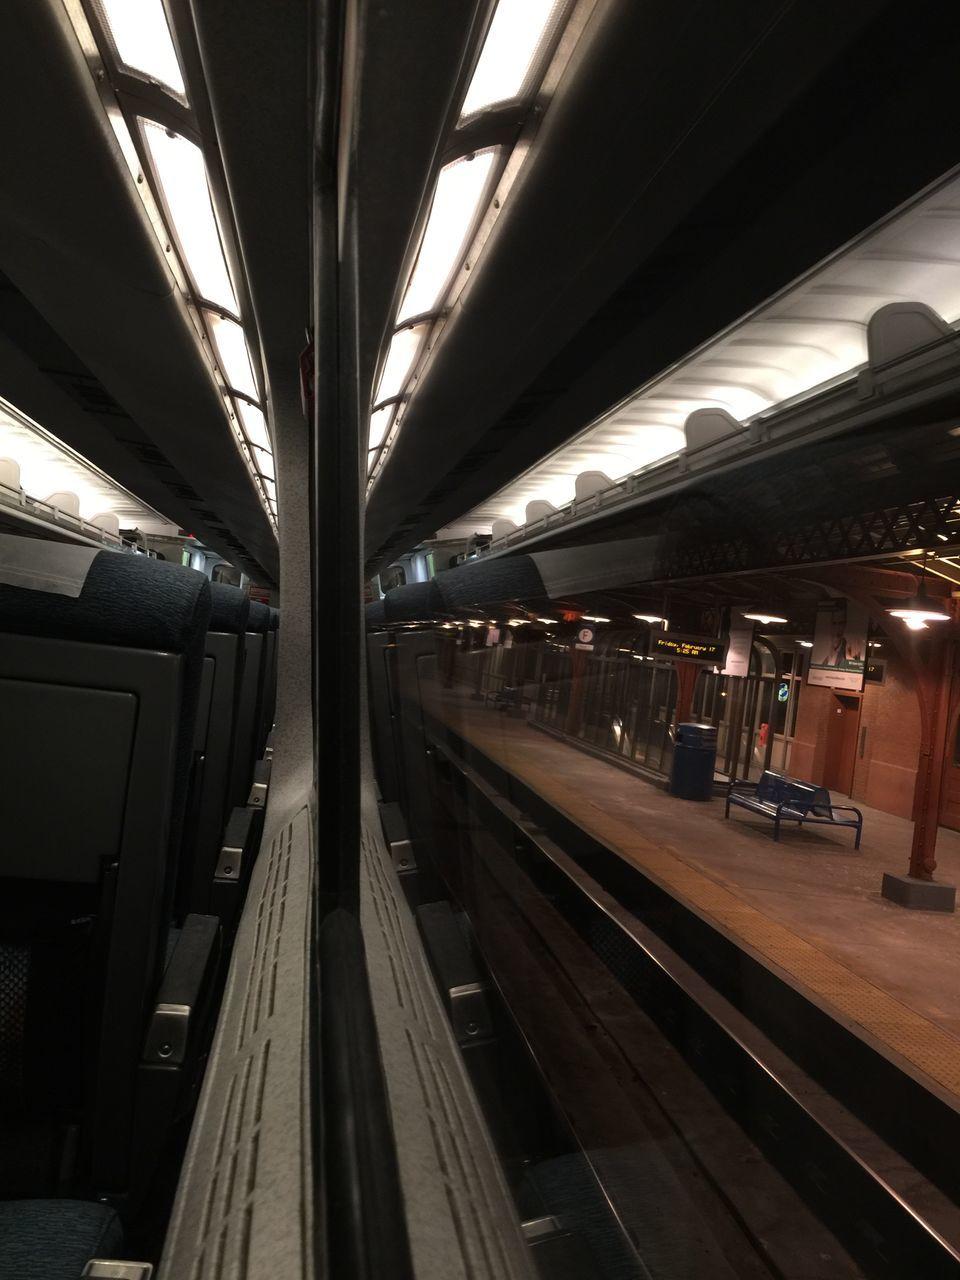 transportation, rail transportation, railroad station, railroad station platform, public transportation, railroad track, indoors, train - vehicle, illuminated, subway train, no people, day